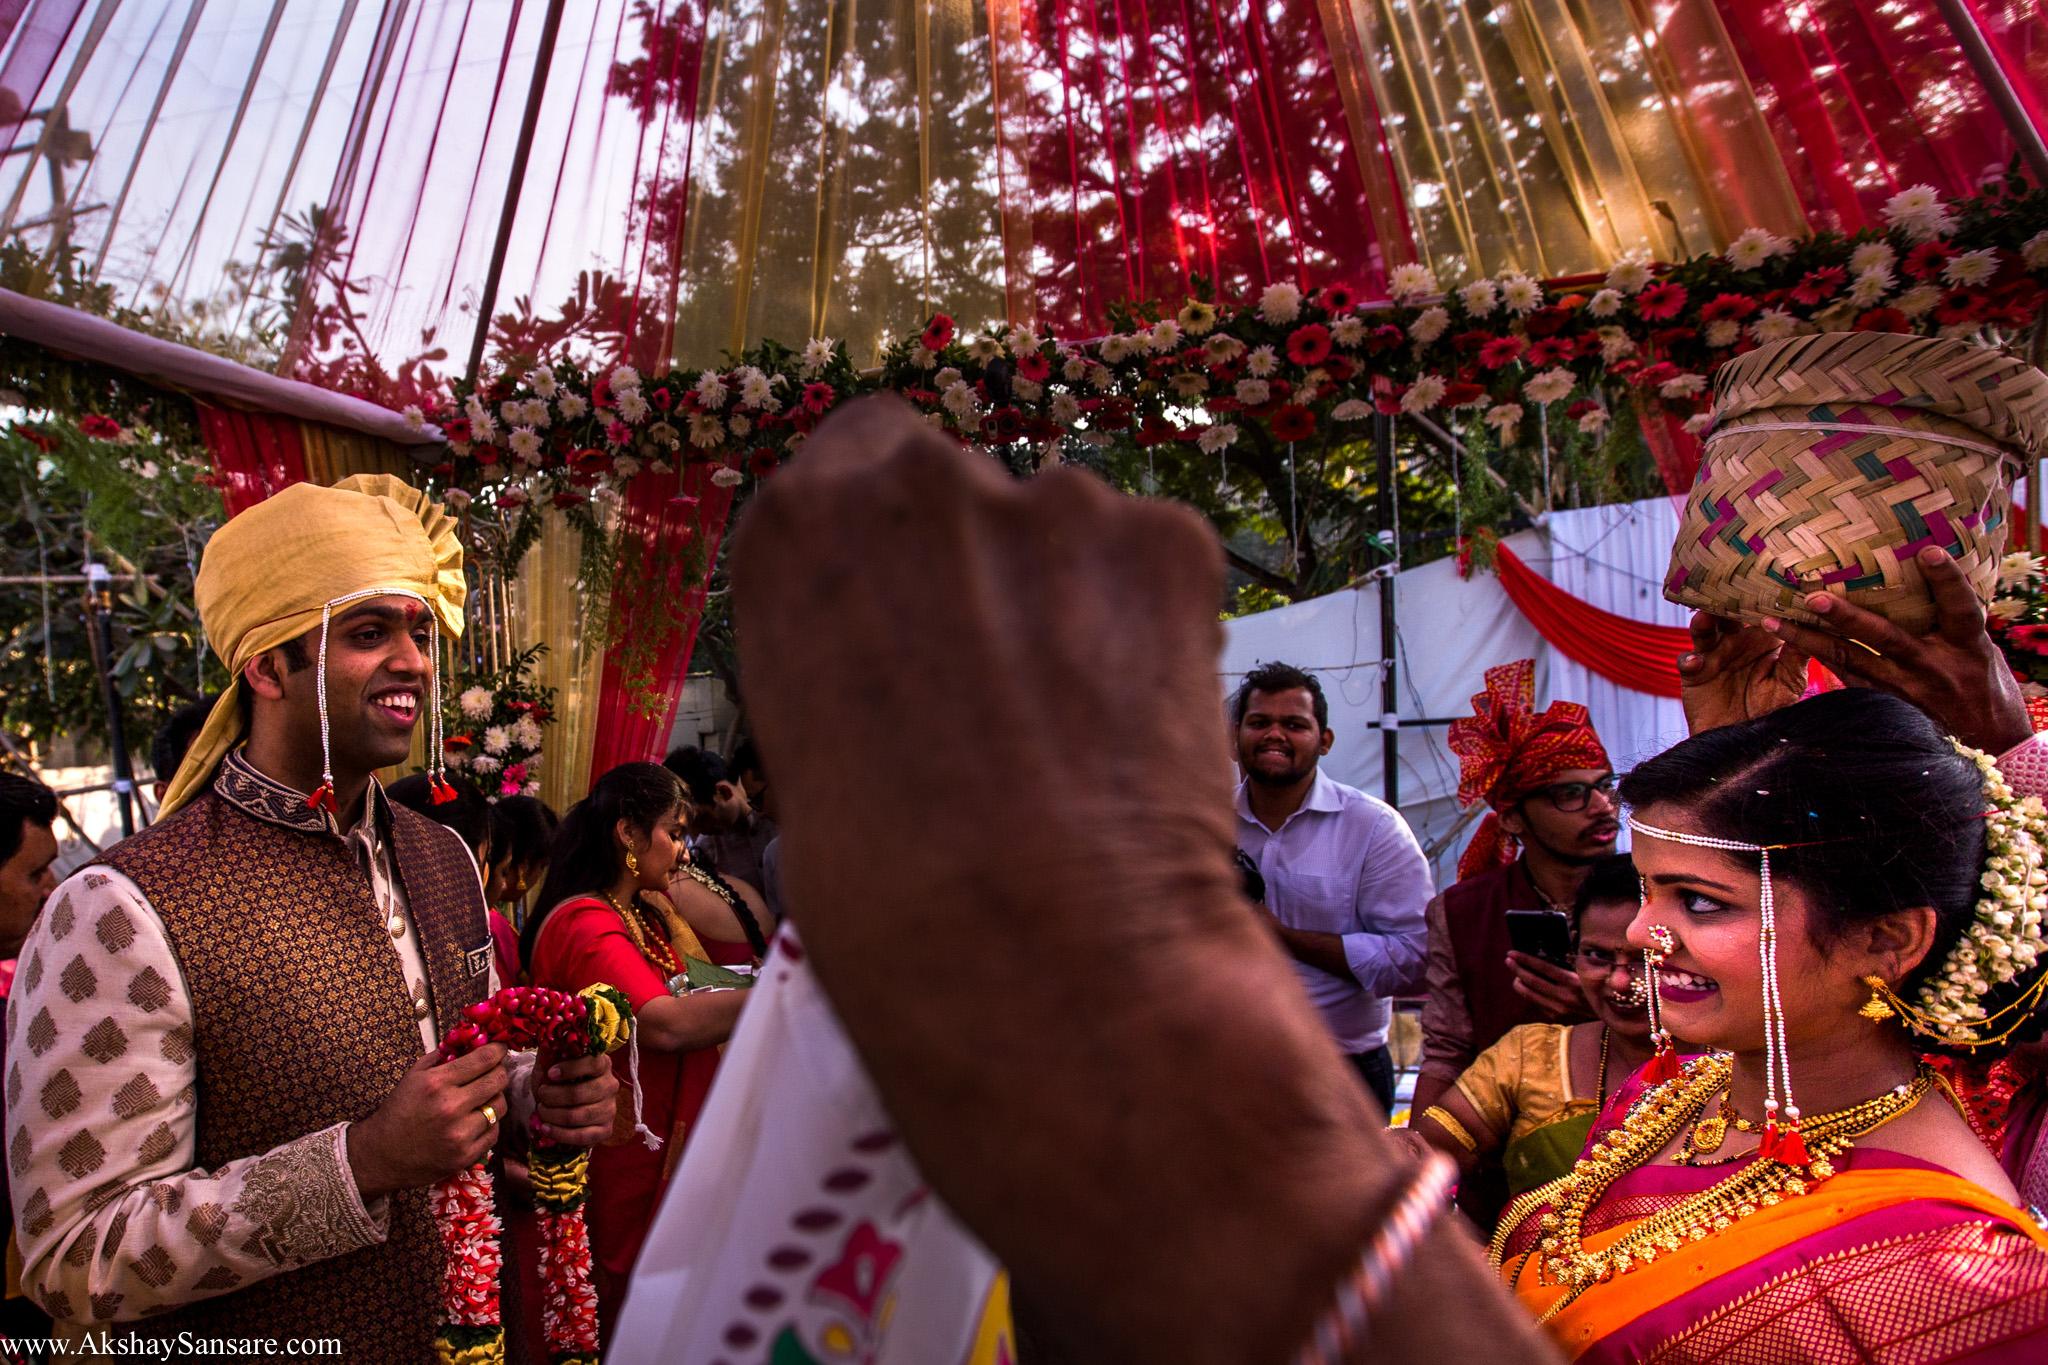 Salil x Kimaya Akshay Sansare Photography Candid wedding Photographer in mumbai best(32).jpg